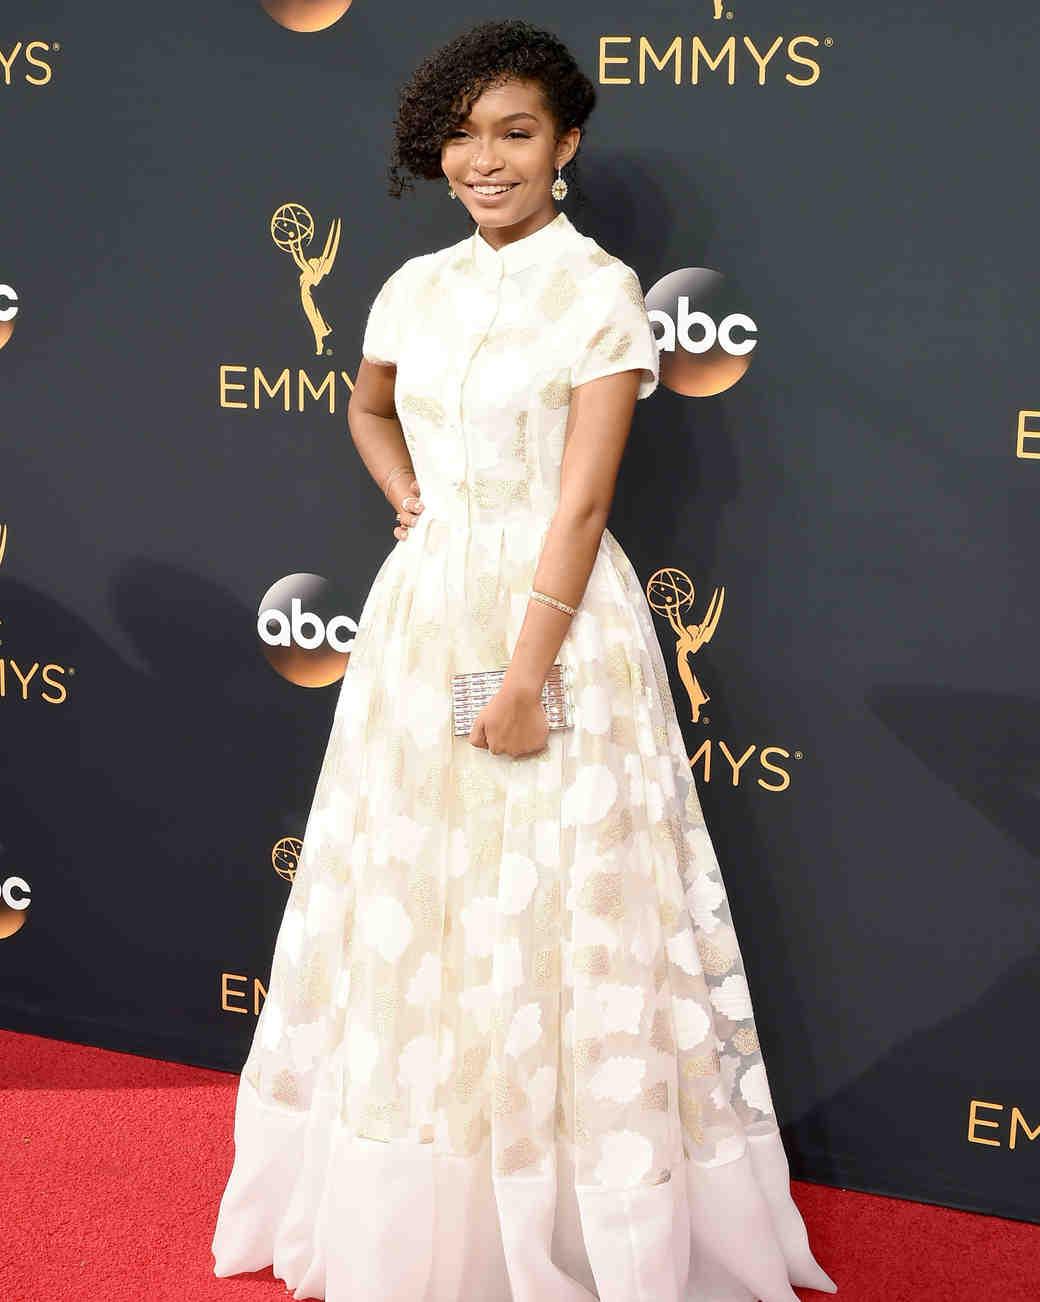 Emmy Awards 2016 Red Carpet Inspire Wedding Dress Martha Stewart Weddings